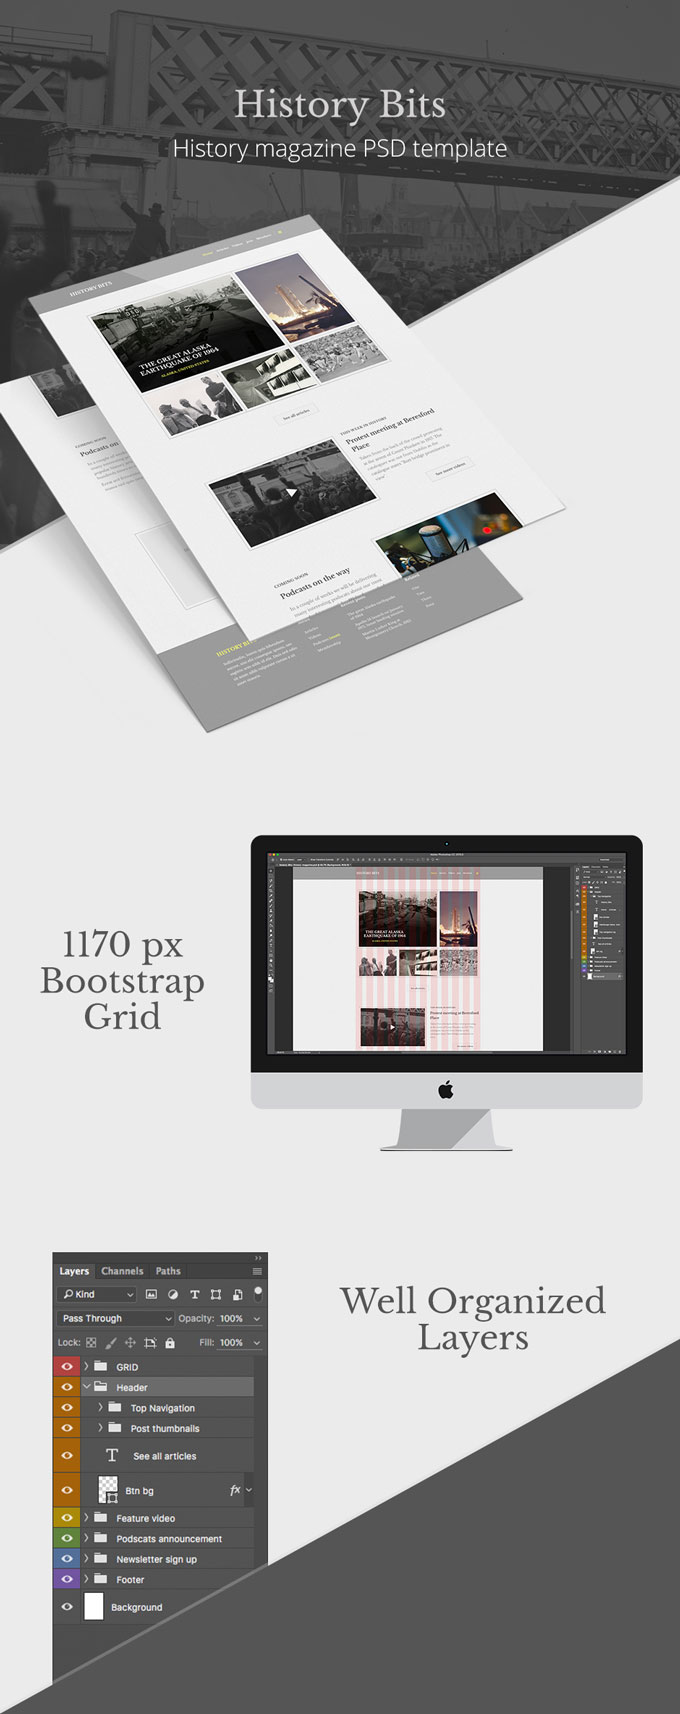 History Bits PSD web template